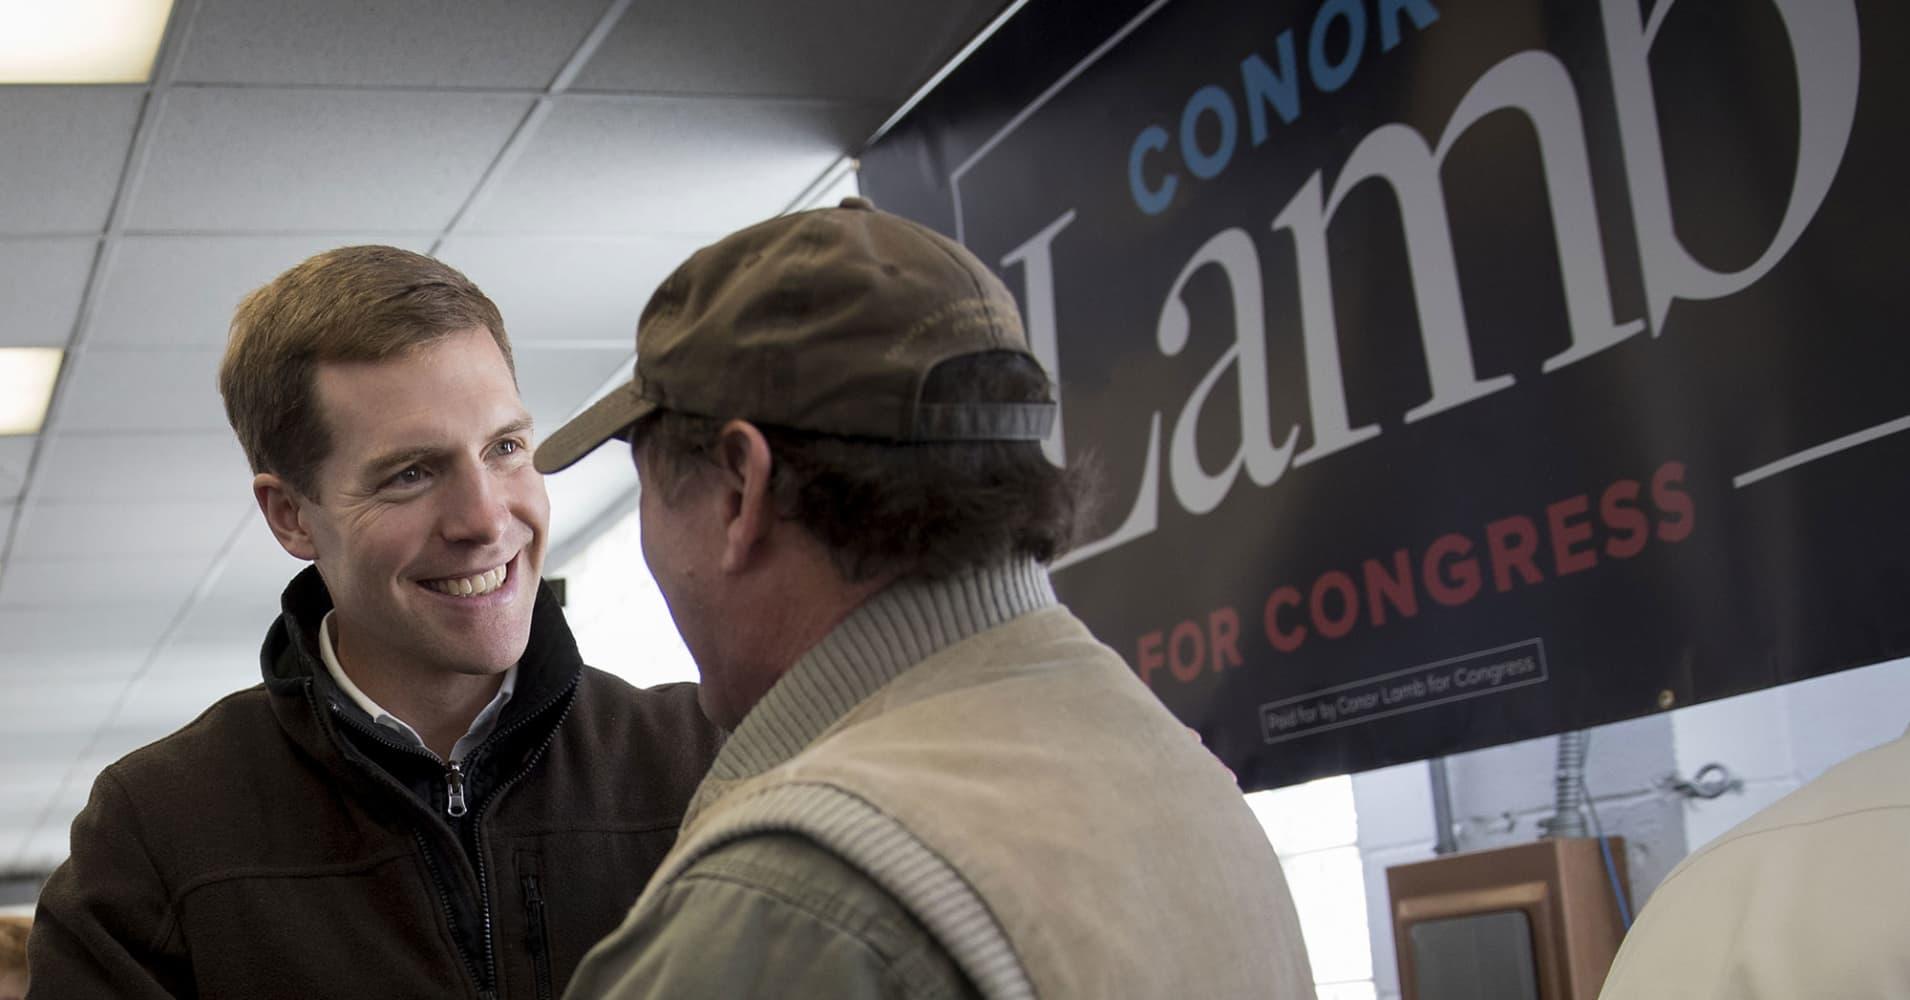 Democrat Conor Lamb seizes the lead in tight Pennsylvania special election, poll says